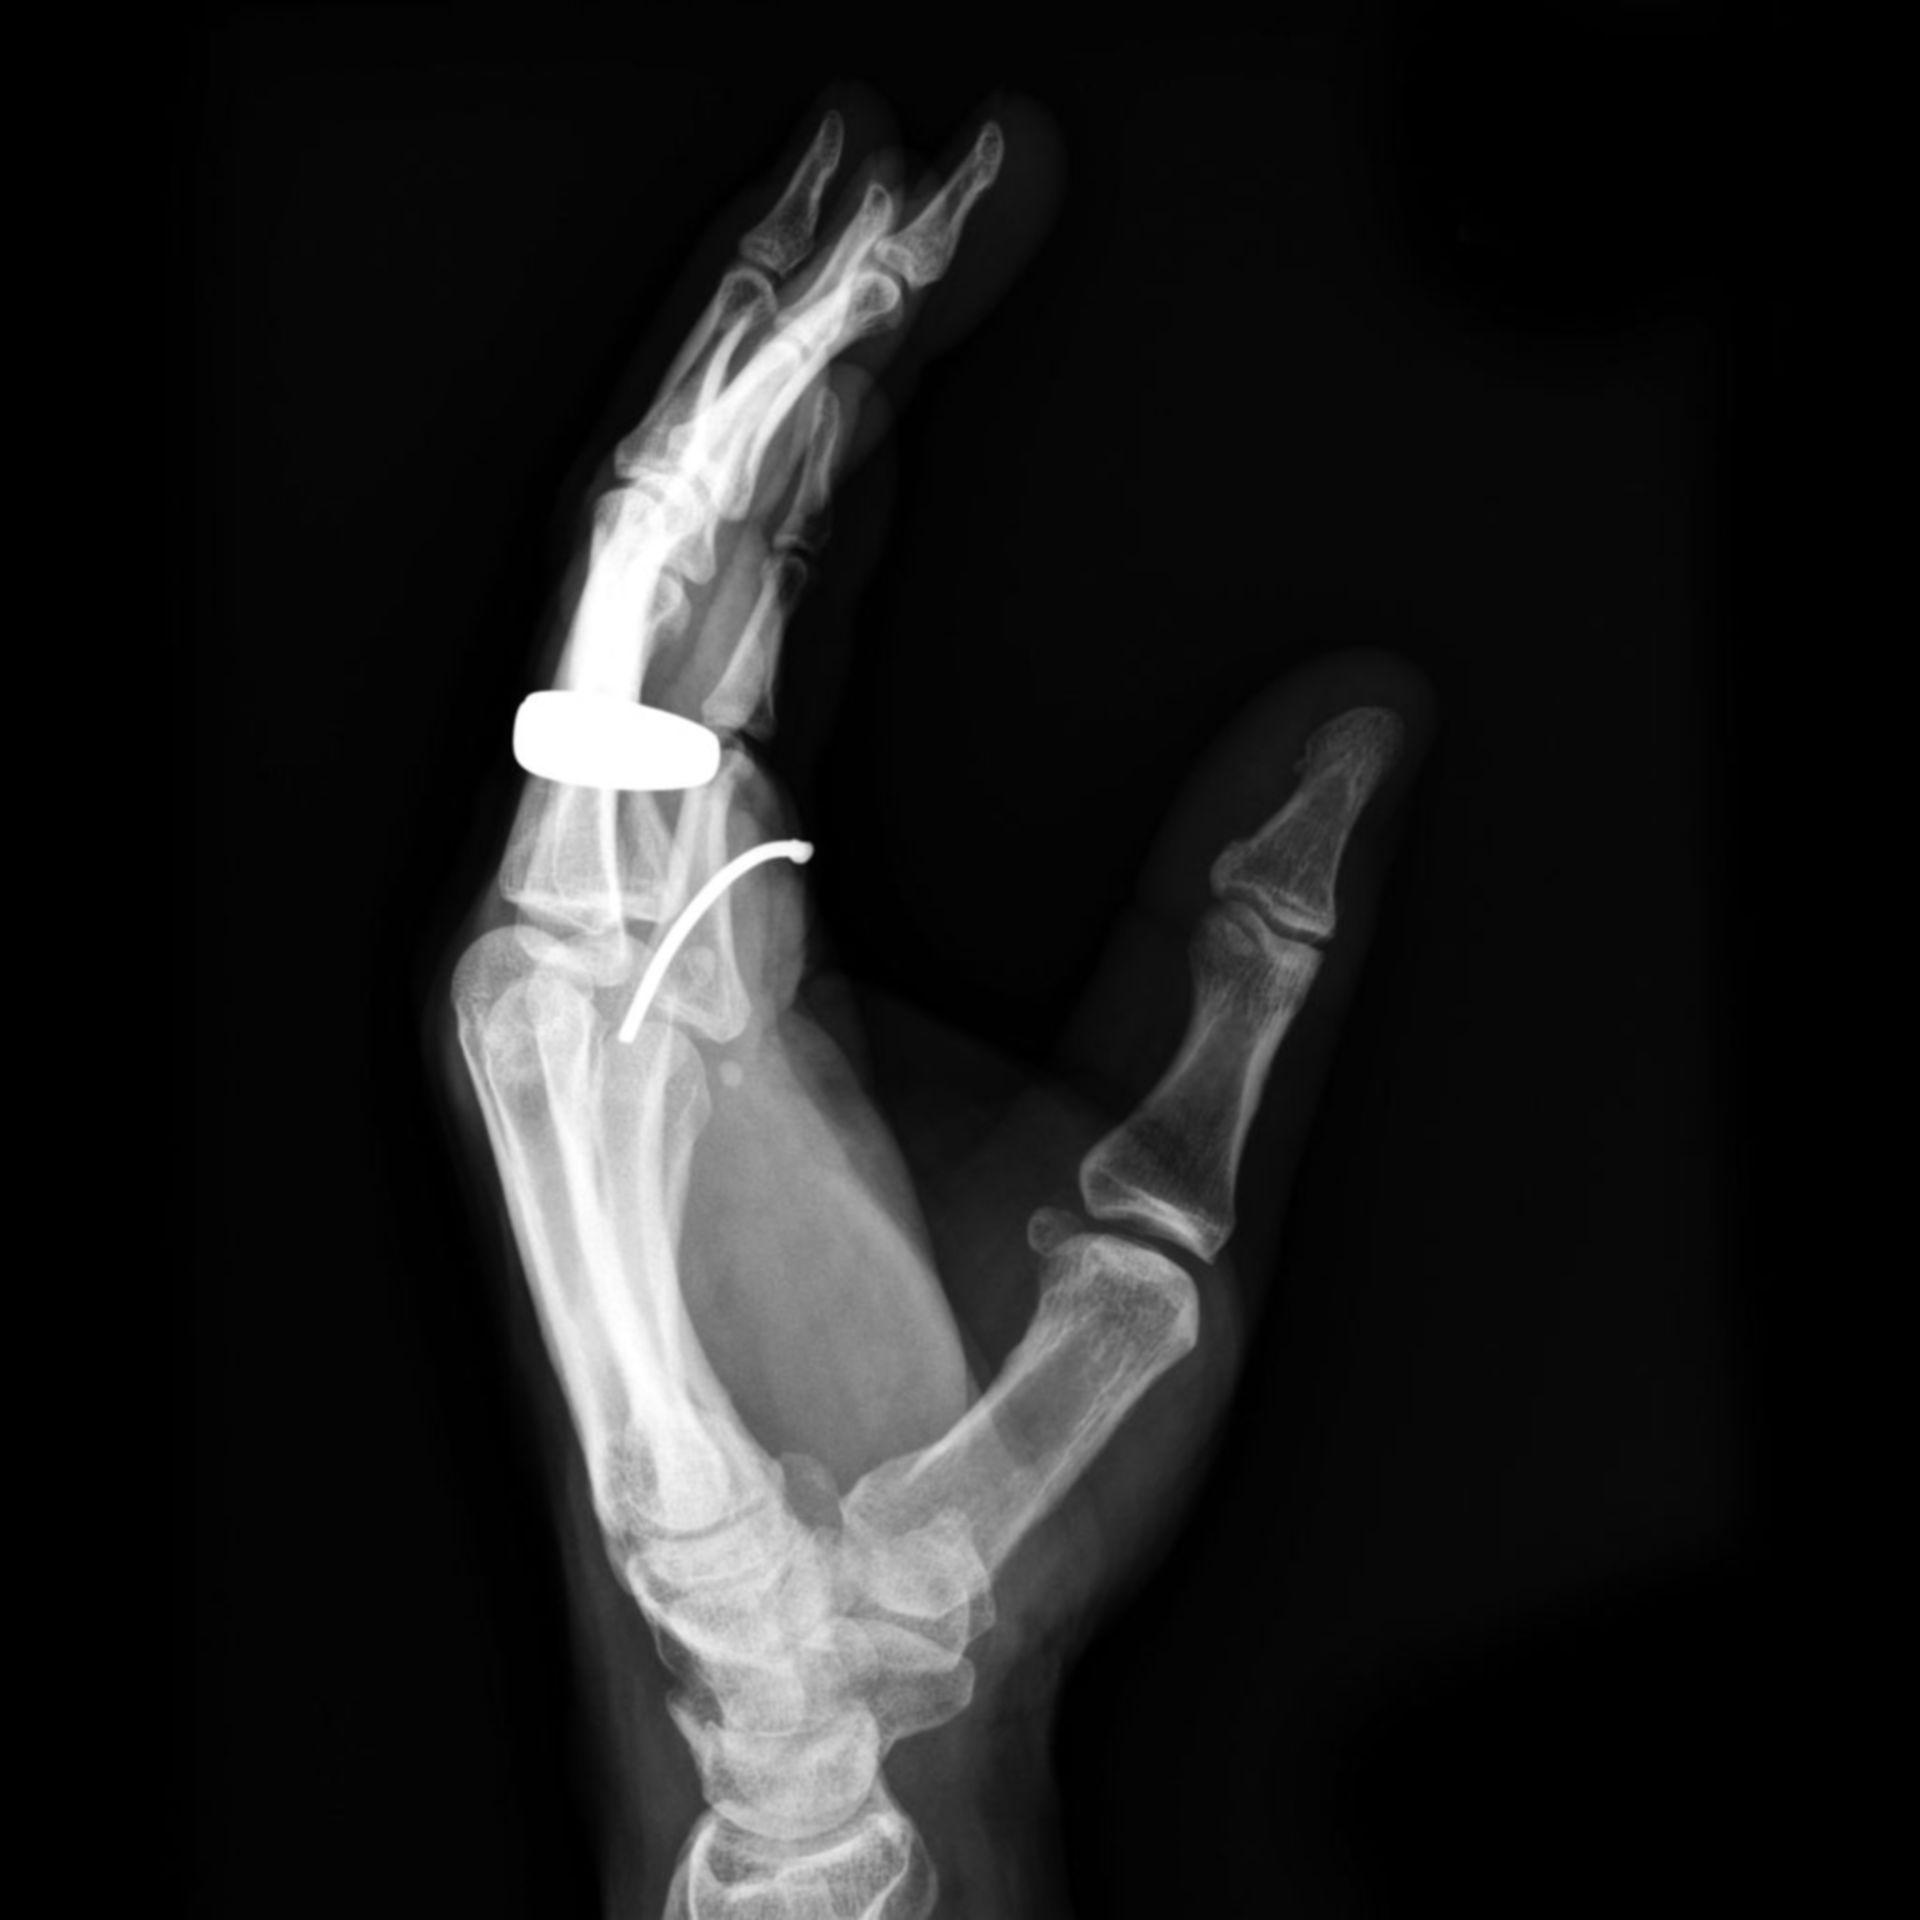 Nagel in der Hand (Röntgen, seitl.)